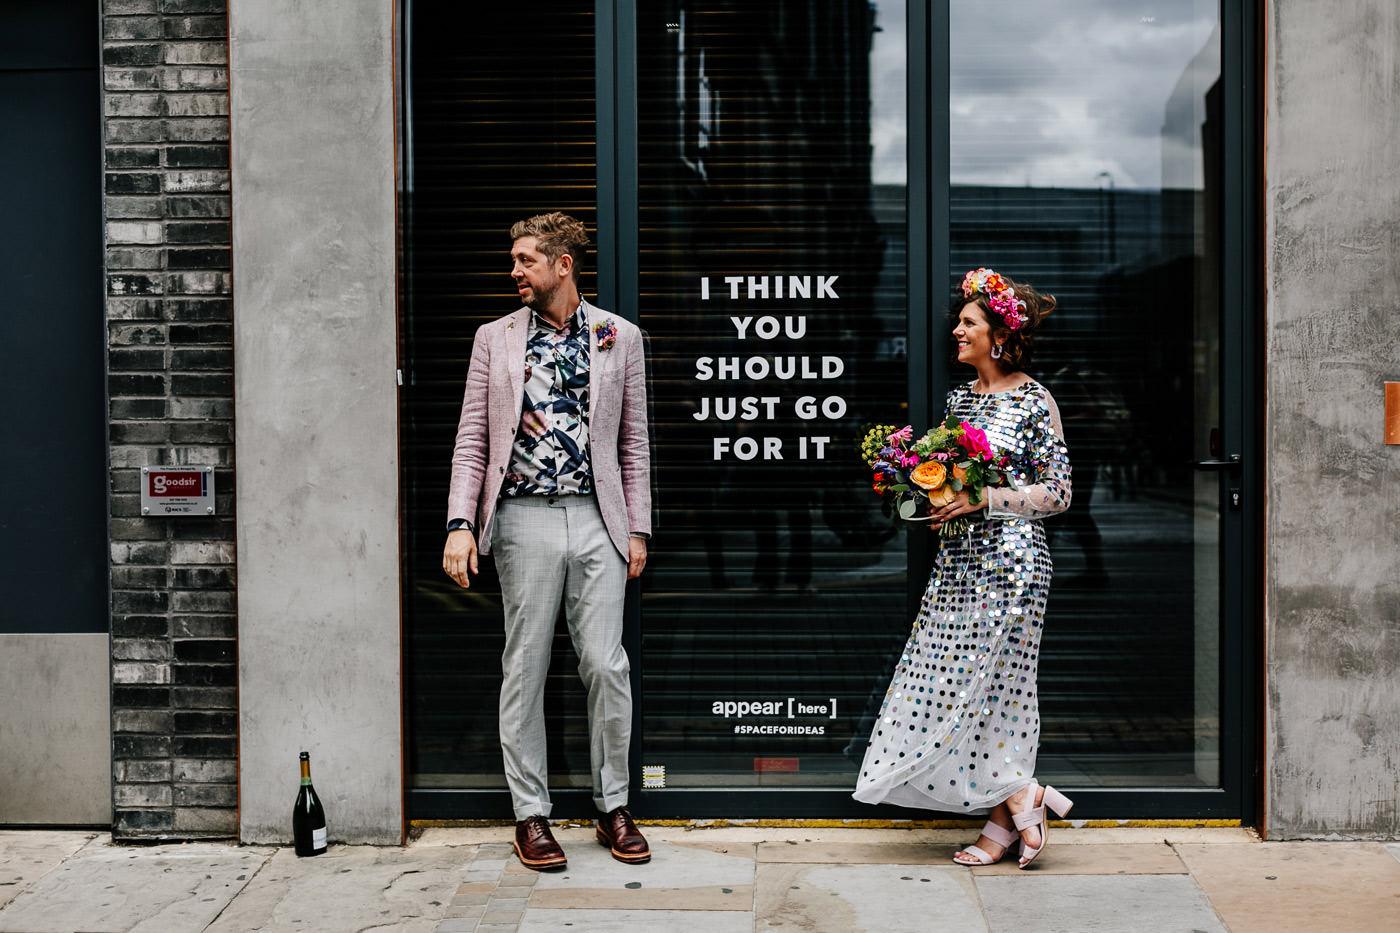 Ace Hotel, shoreditch edgy wedding photographer